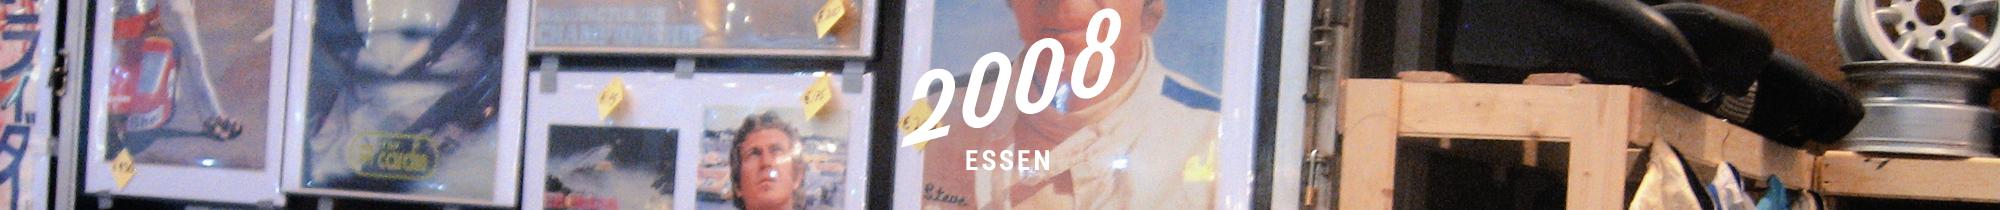 2008-essen-slidi-01